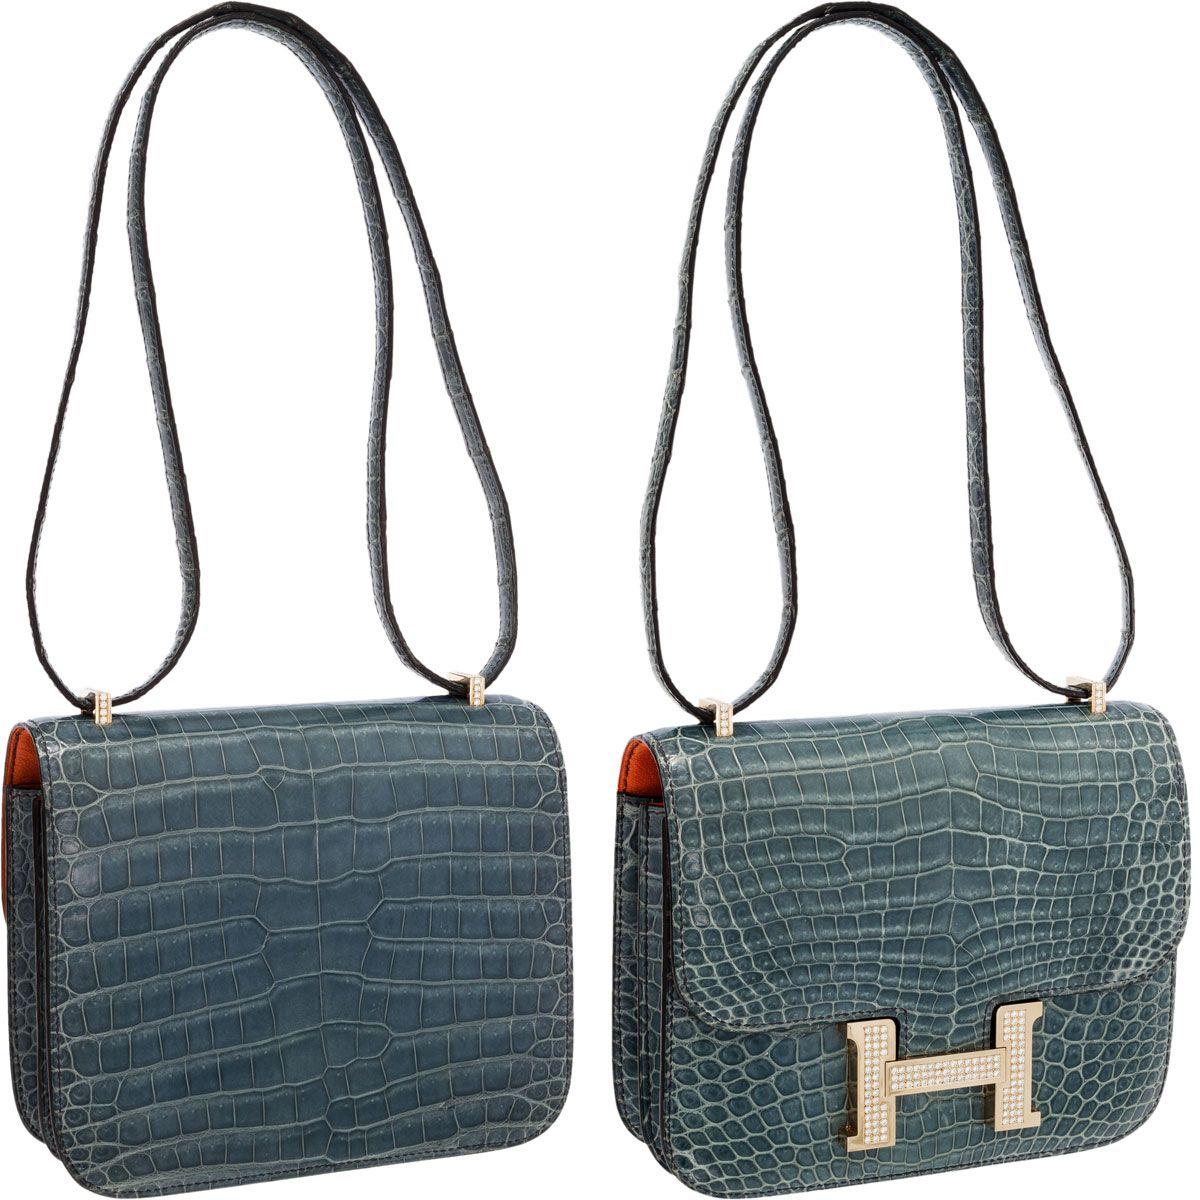 1236bea2a123 Hermes Extraordinary Collection 18cm Diamond Blue Jean Porosus Crocodile  Double-Gusset Constance Bag